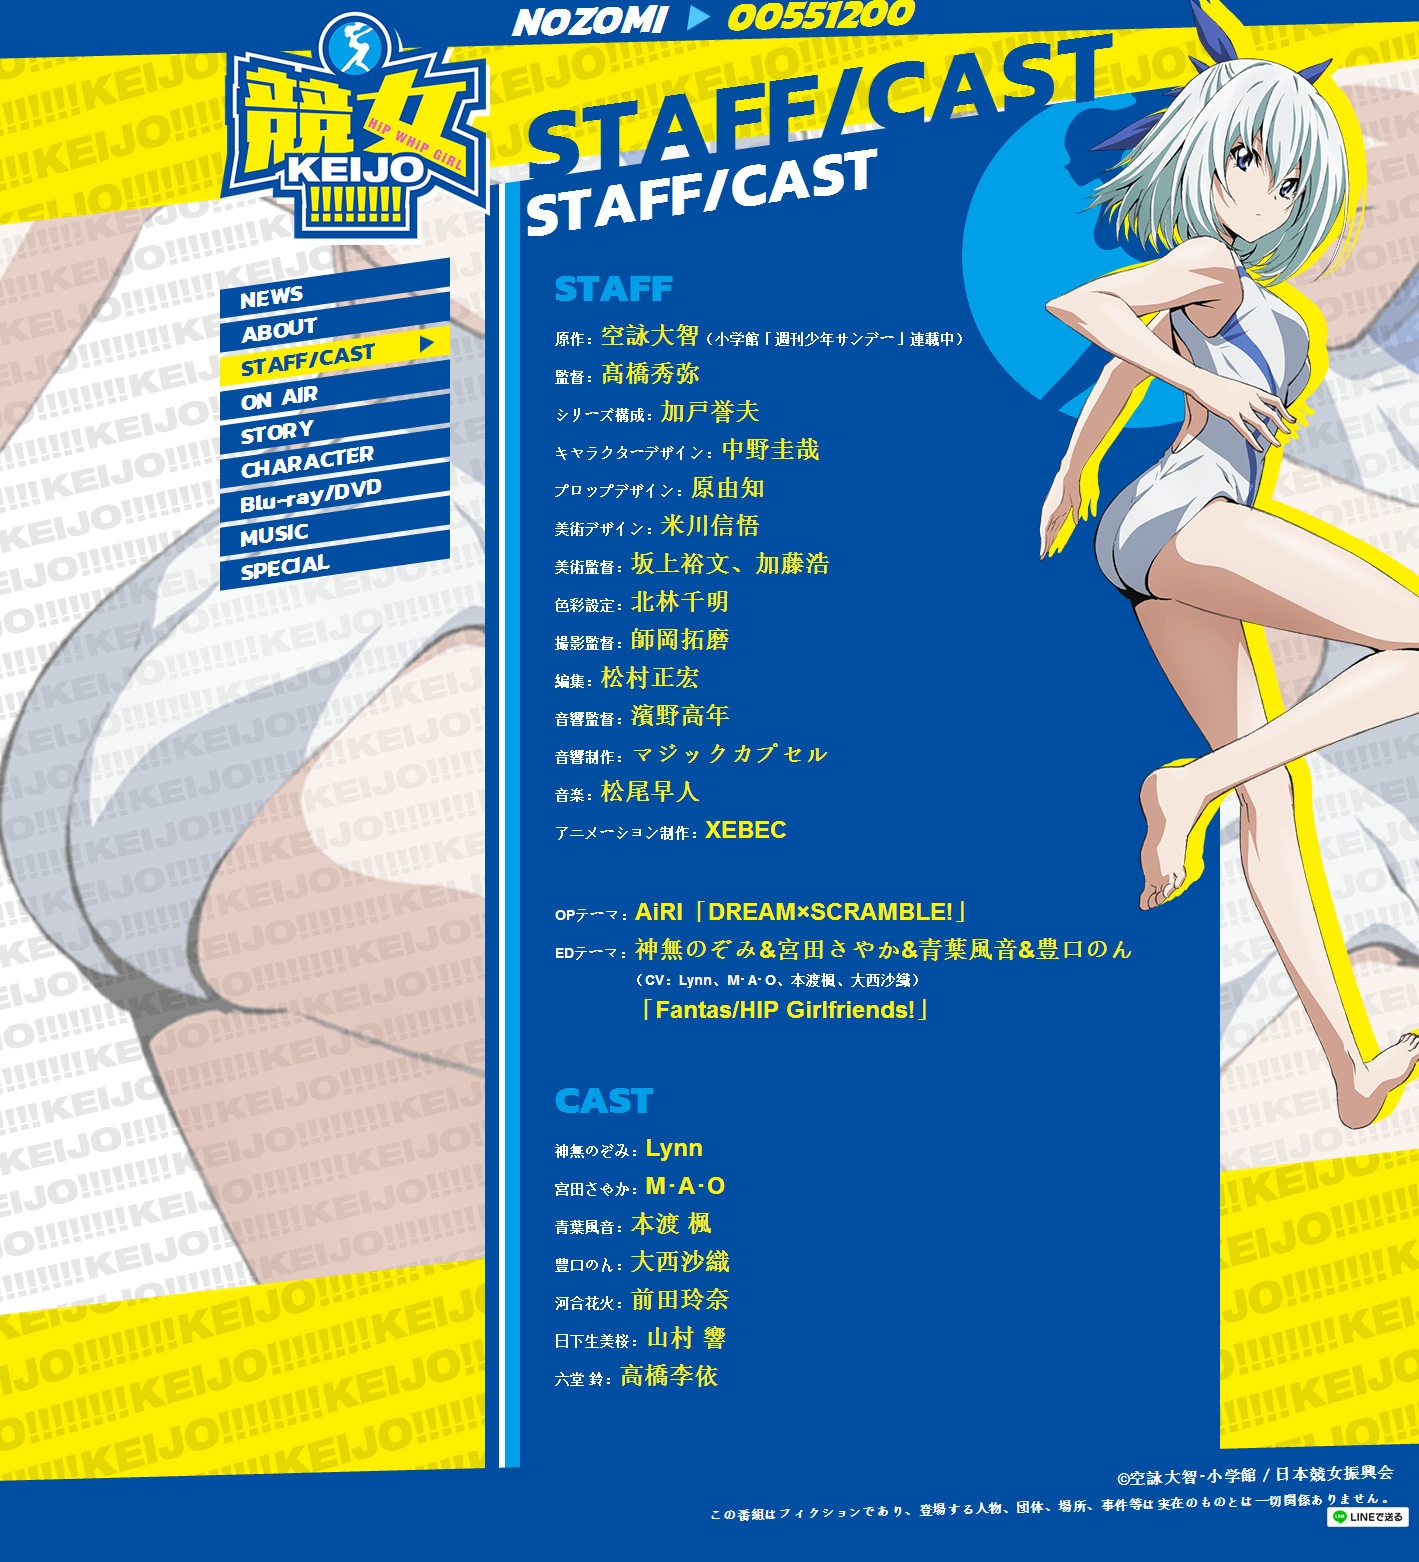 STAFF CAST -TVアニメ『競女!!!!!!!!』公式サイト-.png